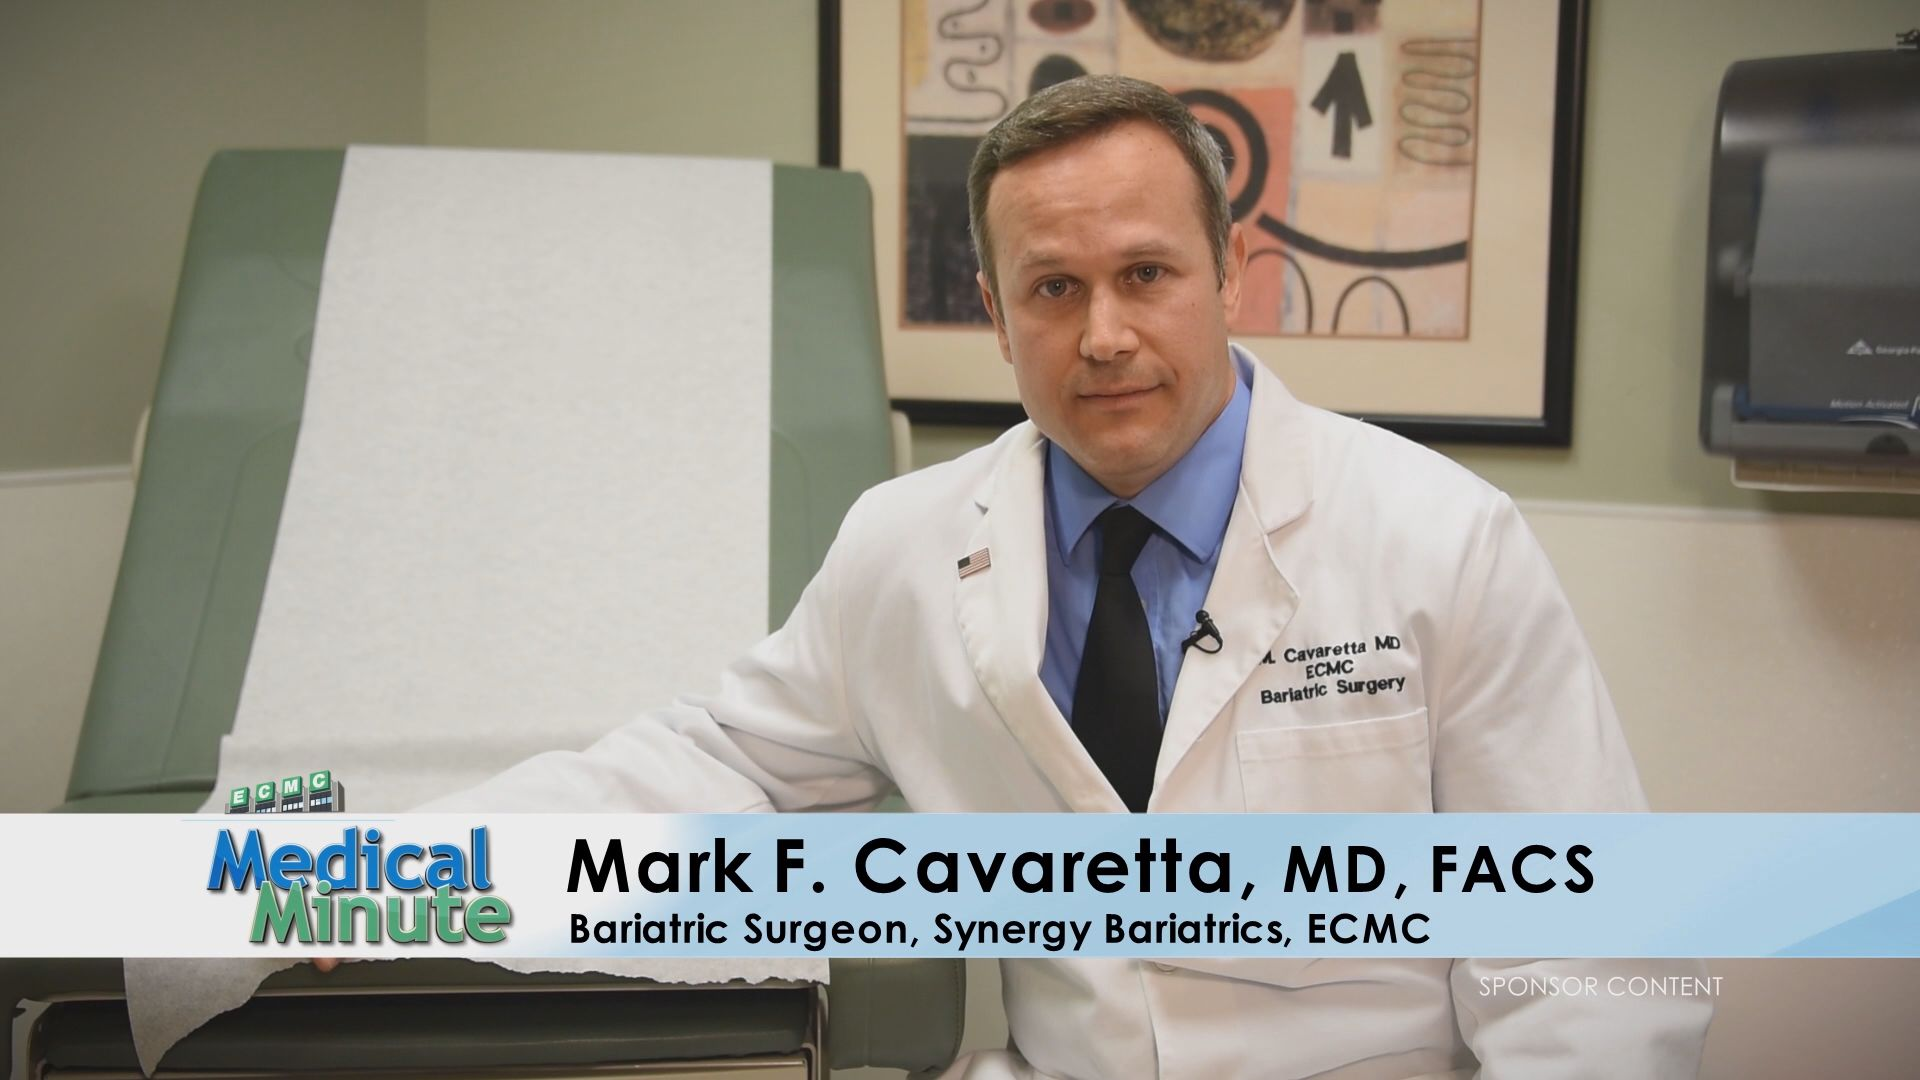 ECMCMedicalMinute Dr.Cavaretta SleeveGastrectomySurgery 012819 STILL